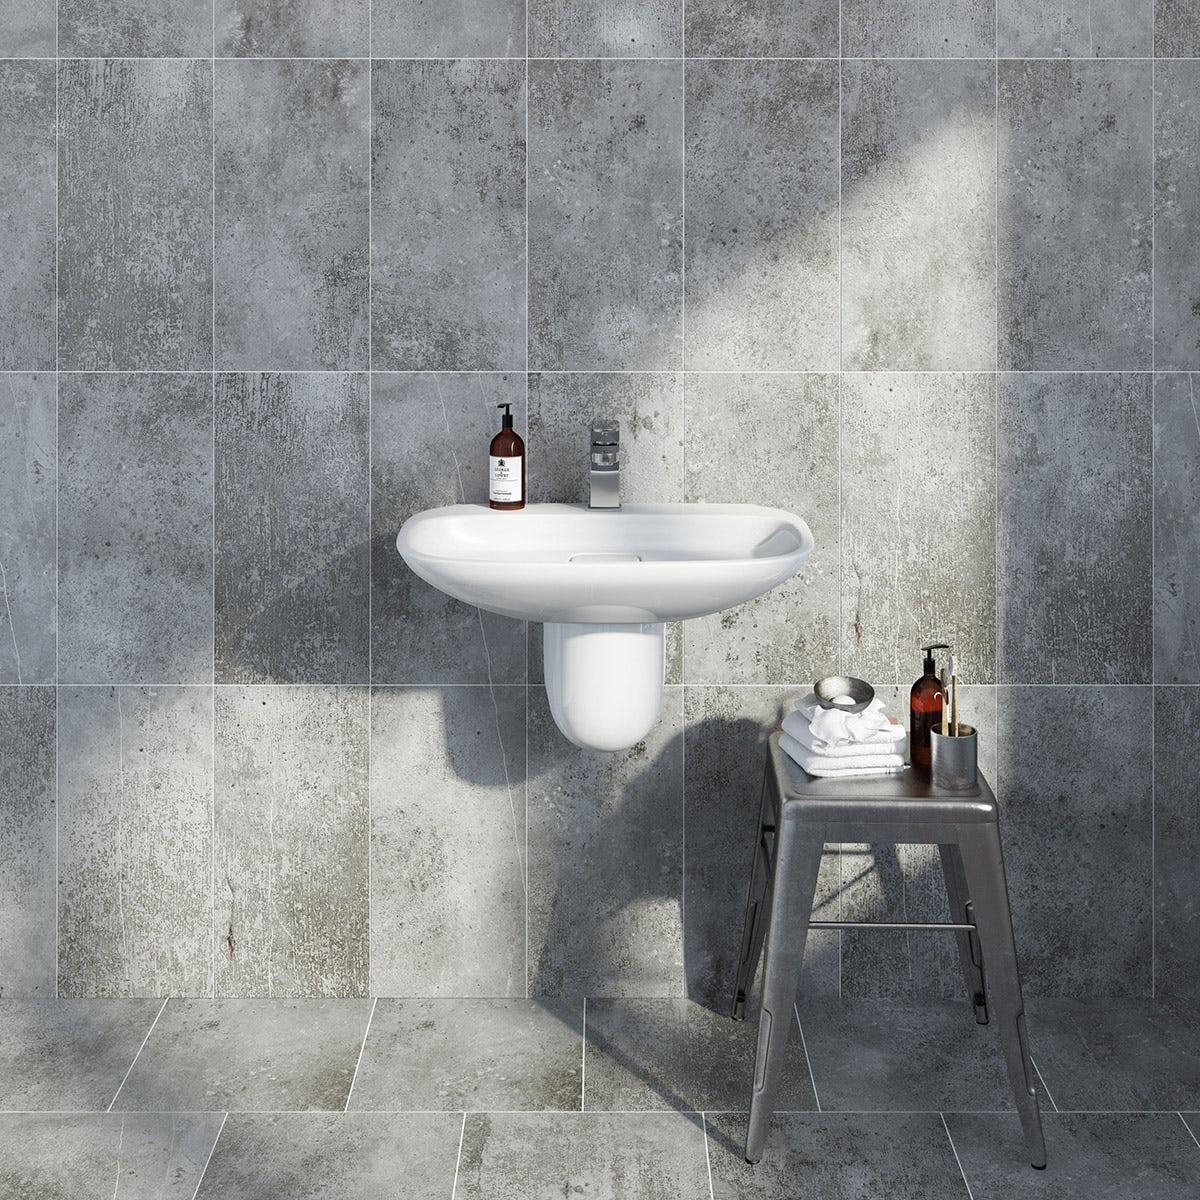 British Ceramic Tile Metropolis dark grey matt tile 248mm x 498mm - Sold by Victoria Plum